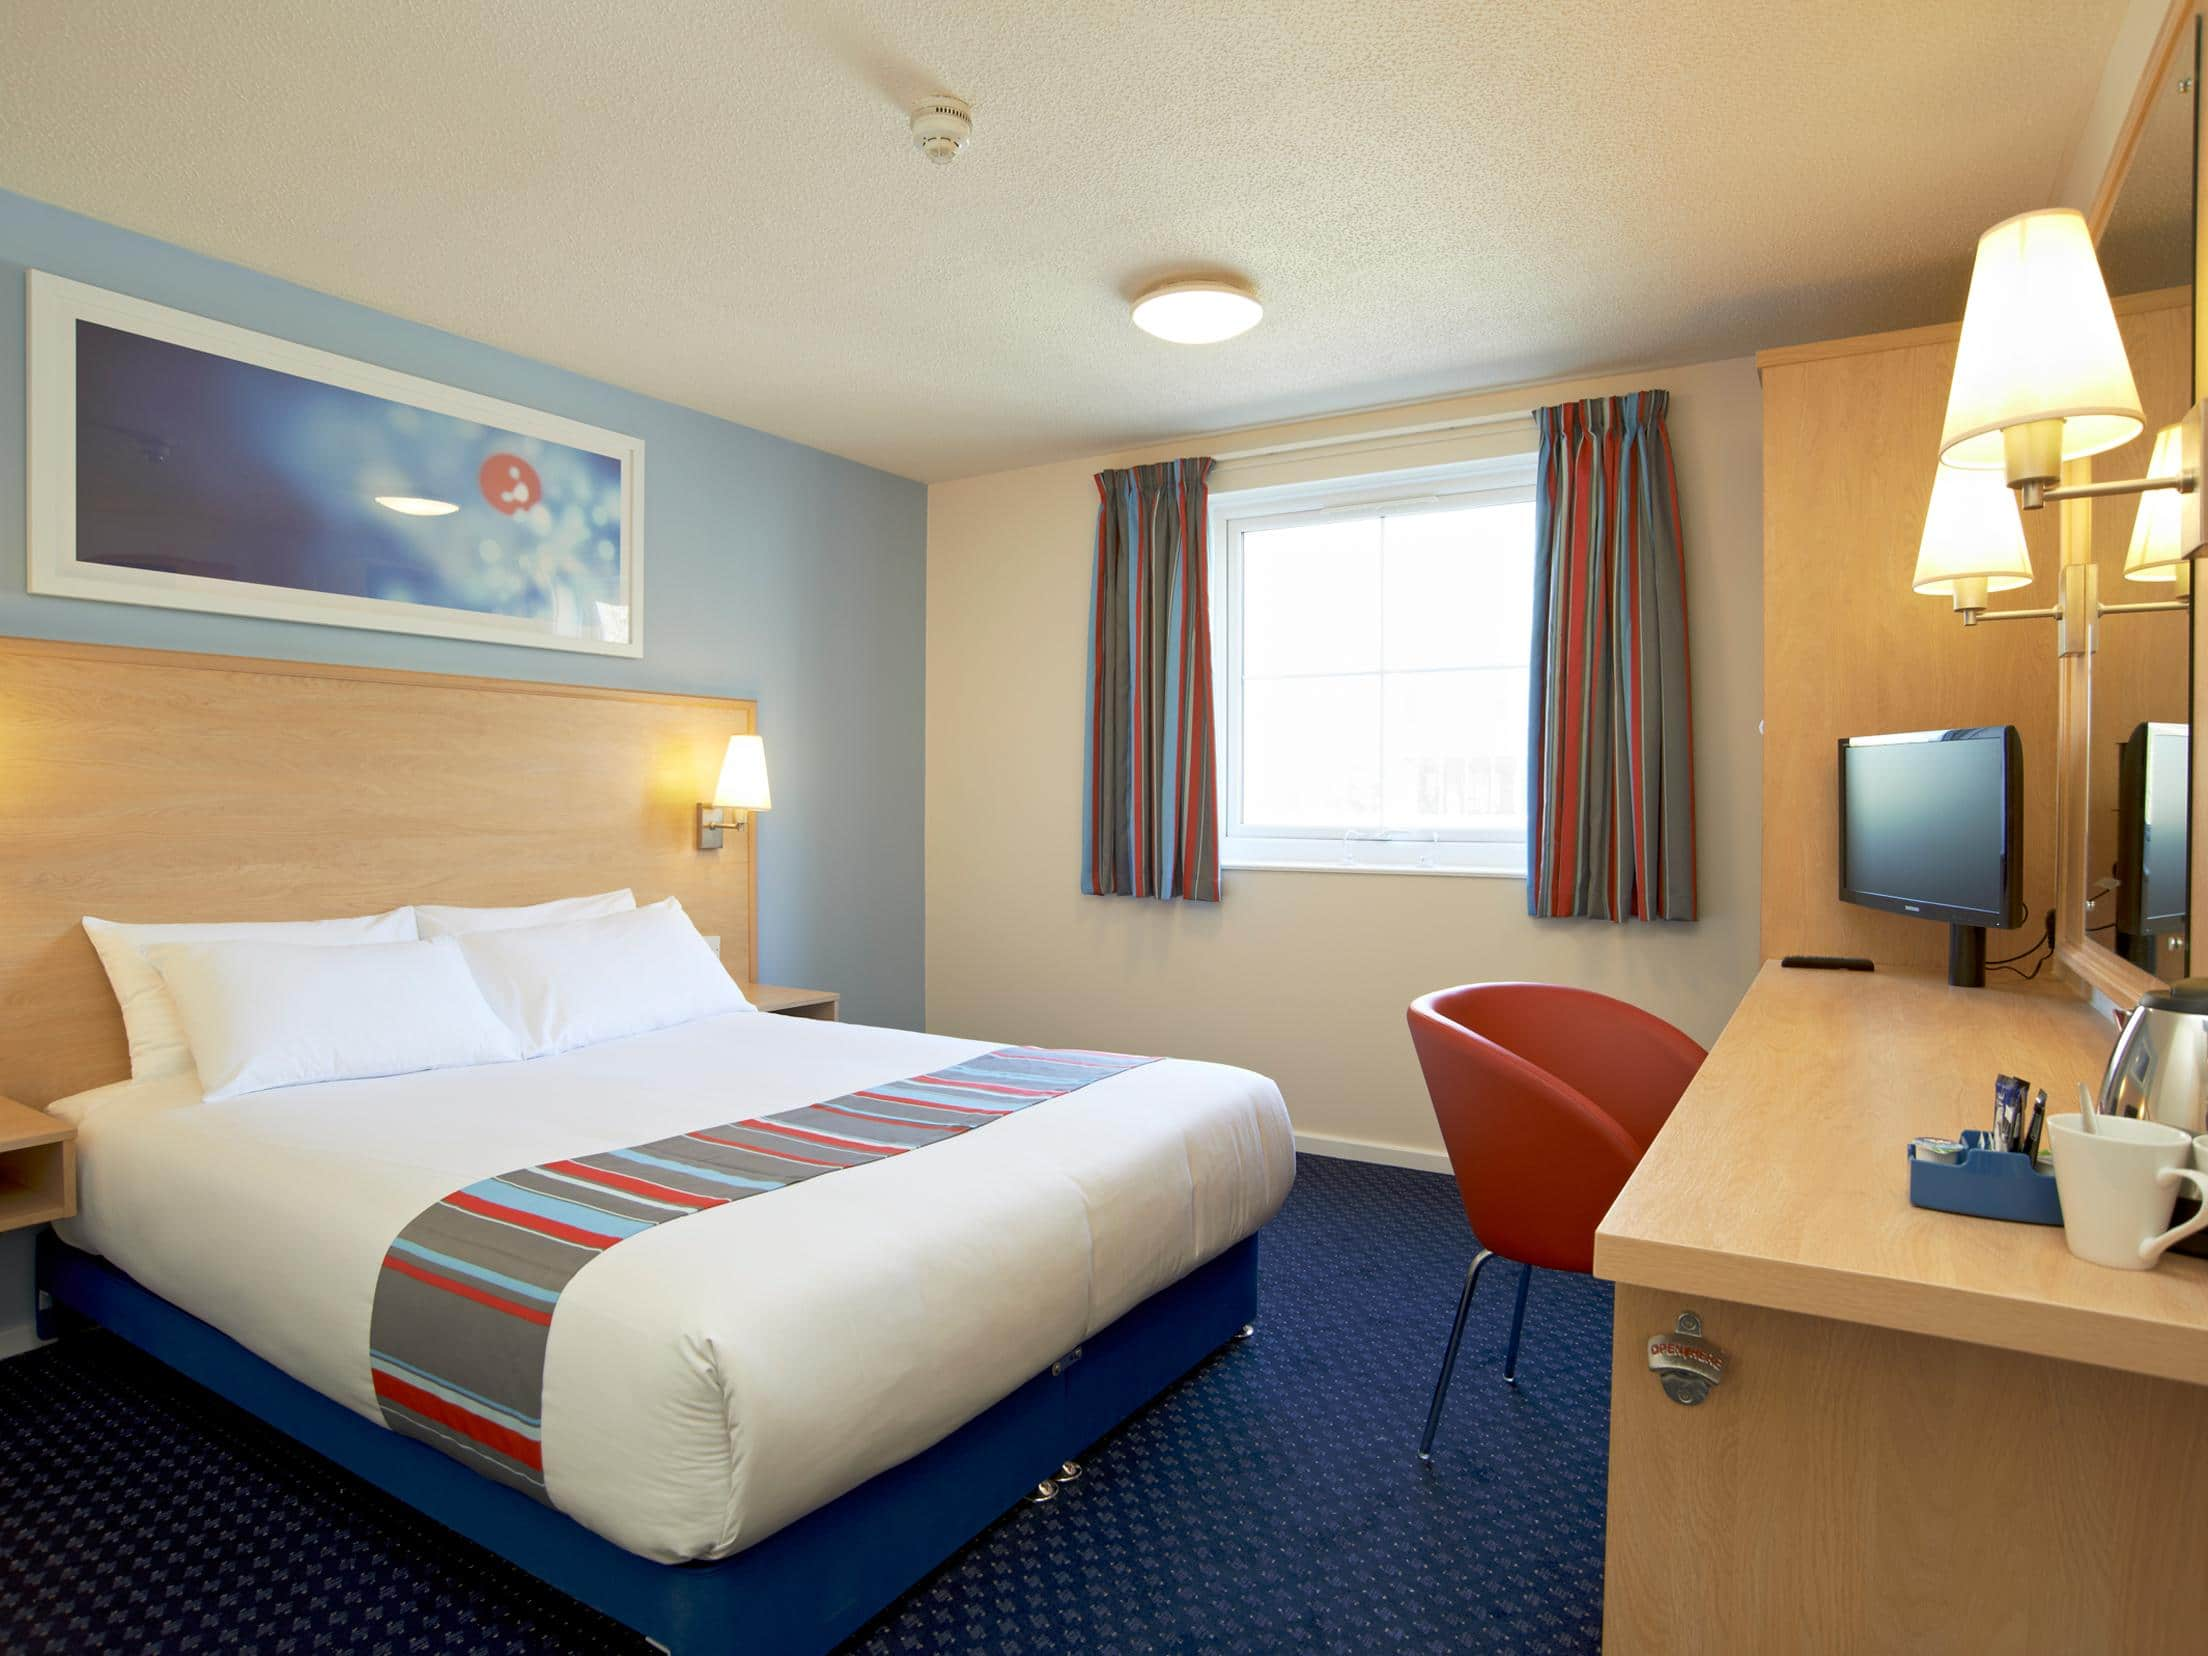 Travelodge Scotch Corner A1 Southbound Hotel   Moto Service Area, Middleton Tyas Lane, Scotch Corner (A1/A66), Richmond DL10 6PQ   +44 871 984 6176